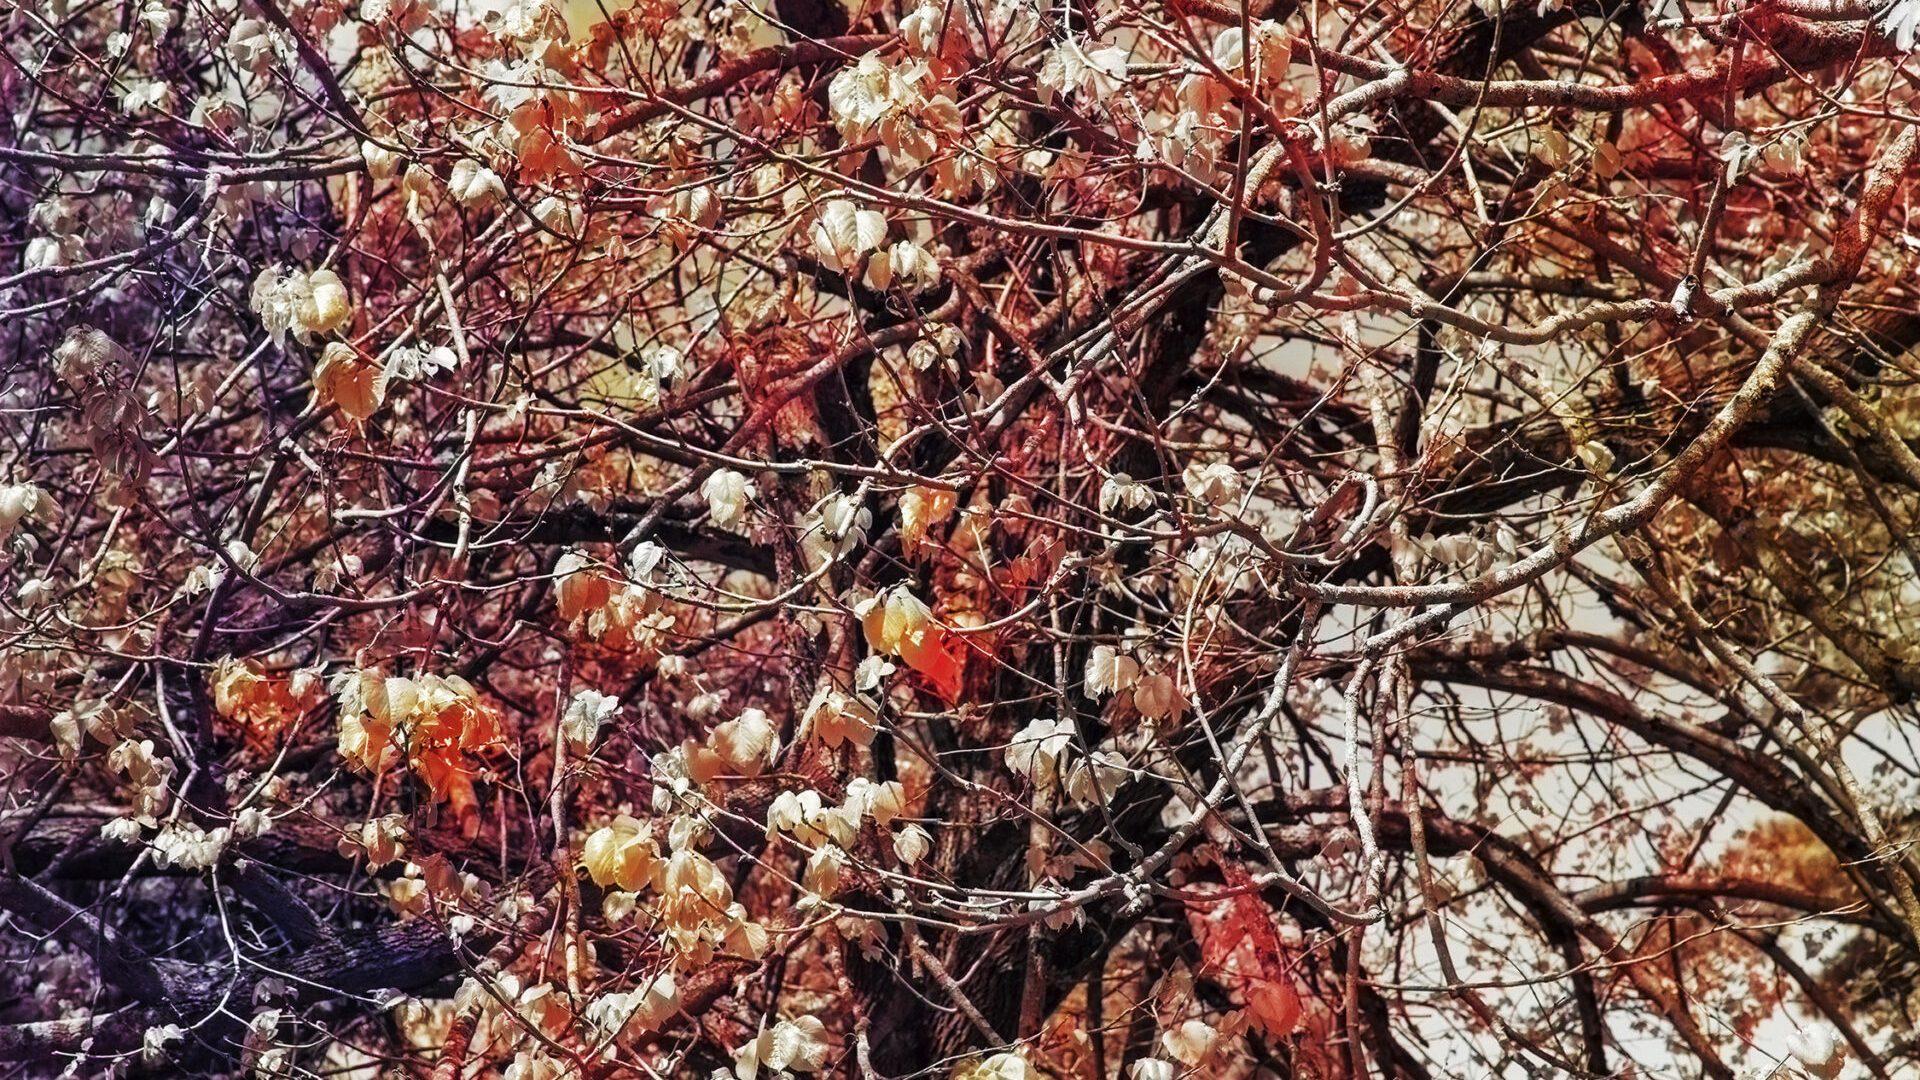 "Trevor Paglen, Bloom (Vermillion), 2020, dye sublimation print, 233.7 cm × 175.3 cm (92"" × 69""), Edition 1 of 3, Edition of 3 + 1 AP, PHOTO, No. 75674.01, Alt # 385, format of photography: digital, source of photography: Trevor Paglen Studio"